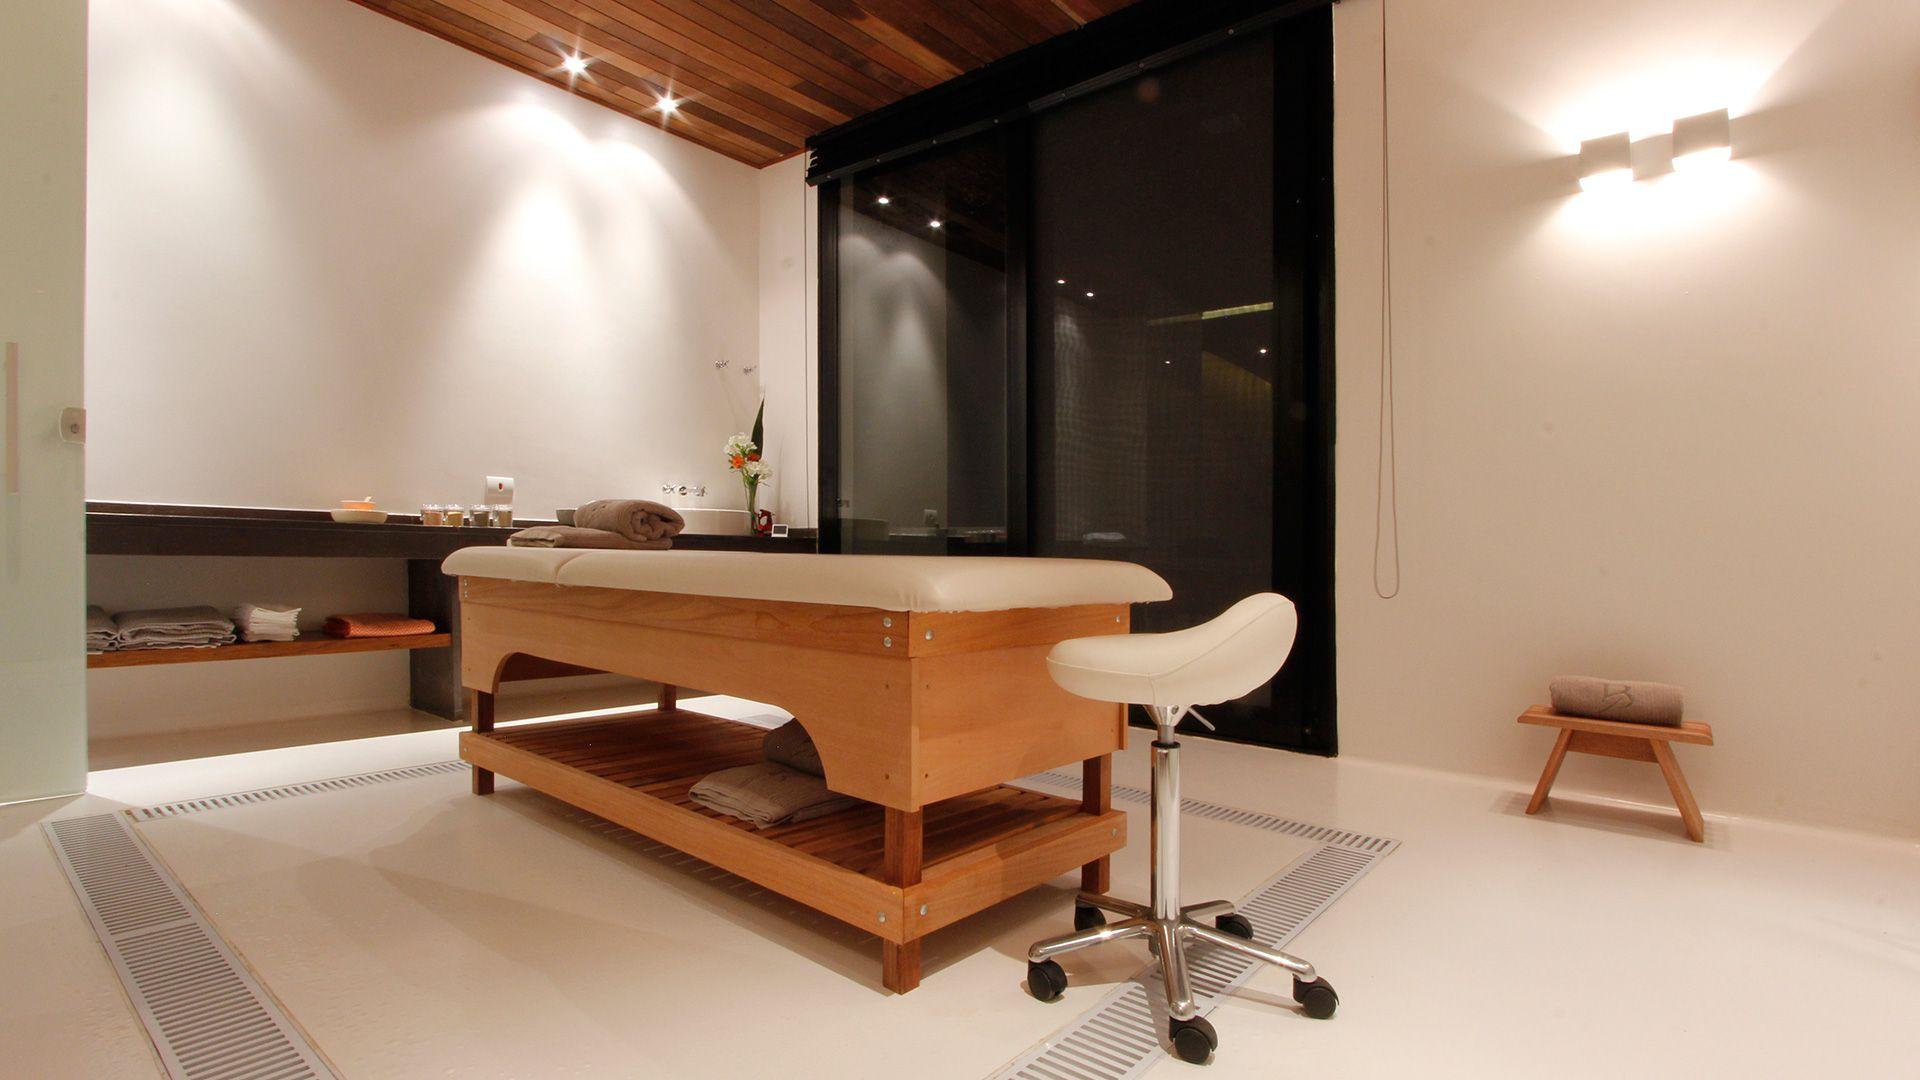 12-spa-hotel-botanique-foto-sala-de-tratamento